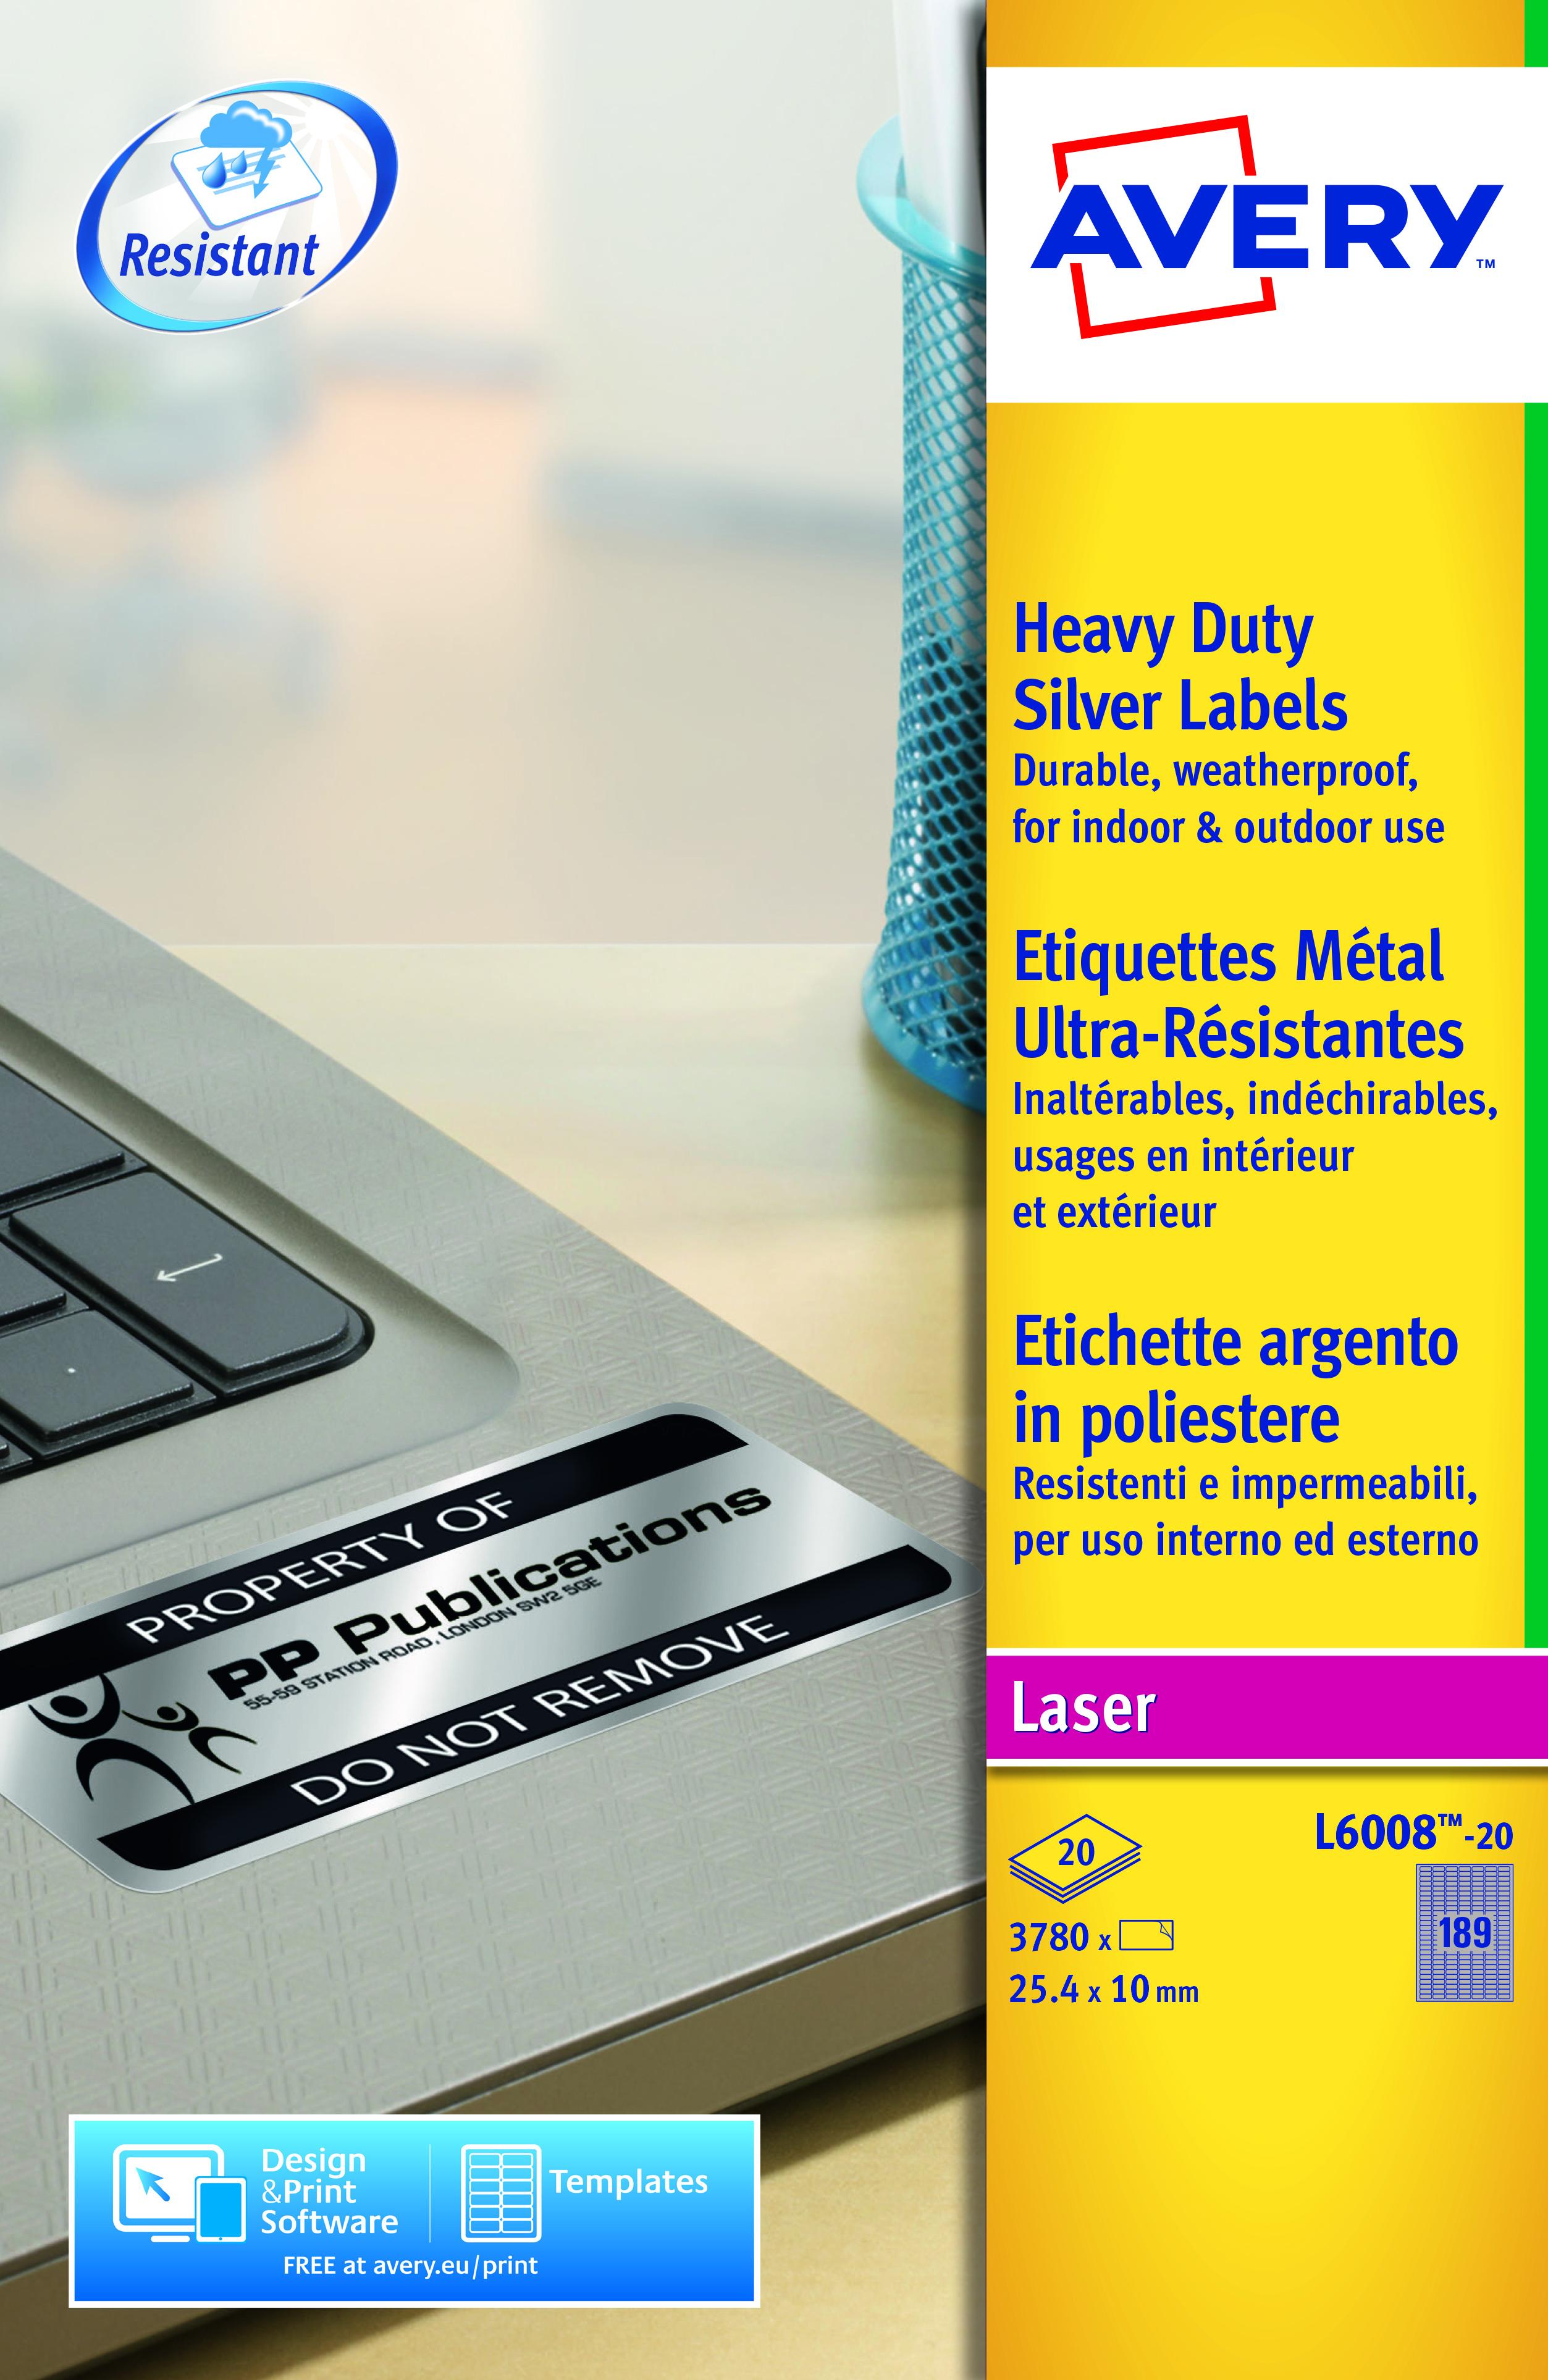 Avery HD Label 25.4x10mm SL PK3780